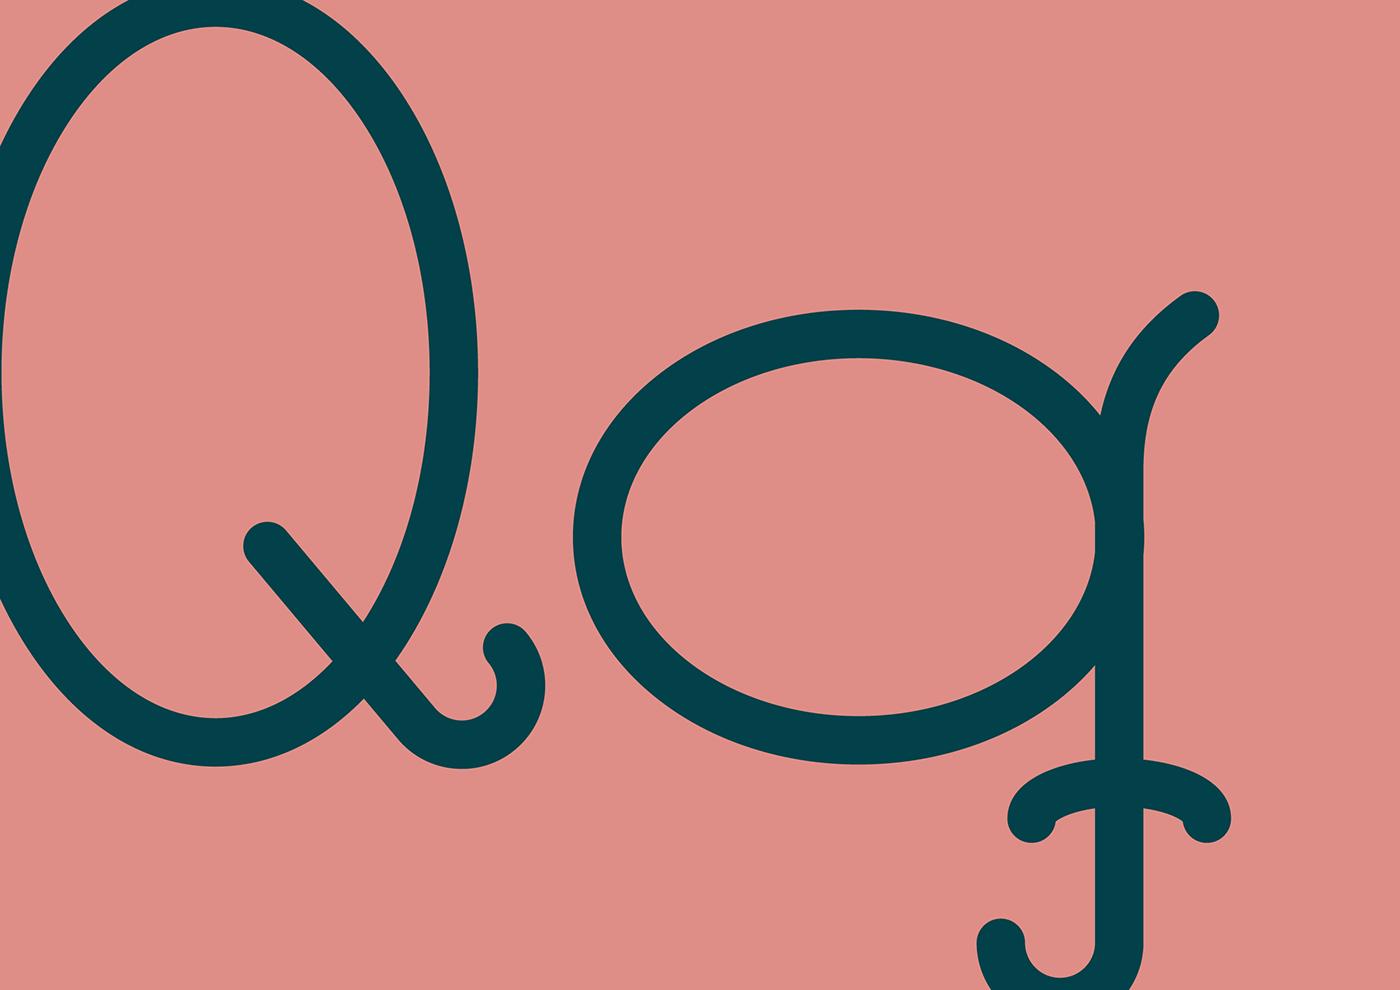 DMJX dmjxid DMJX1720 type typography   quirky cute font Fontself ant